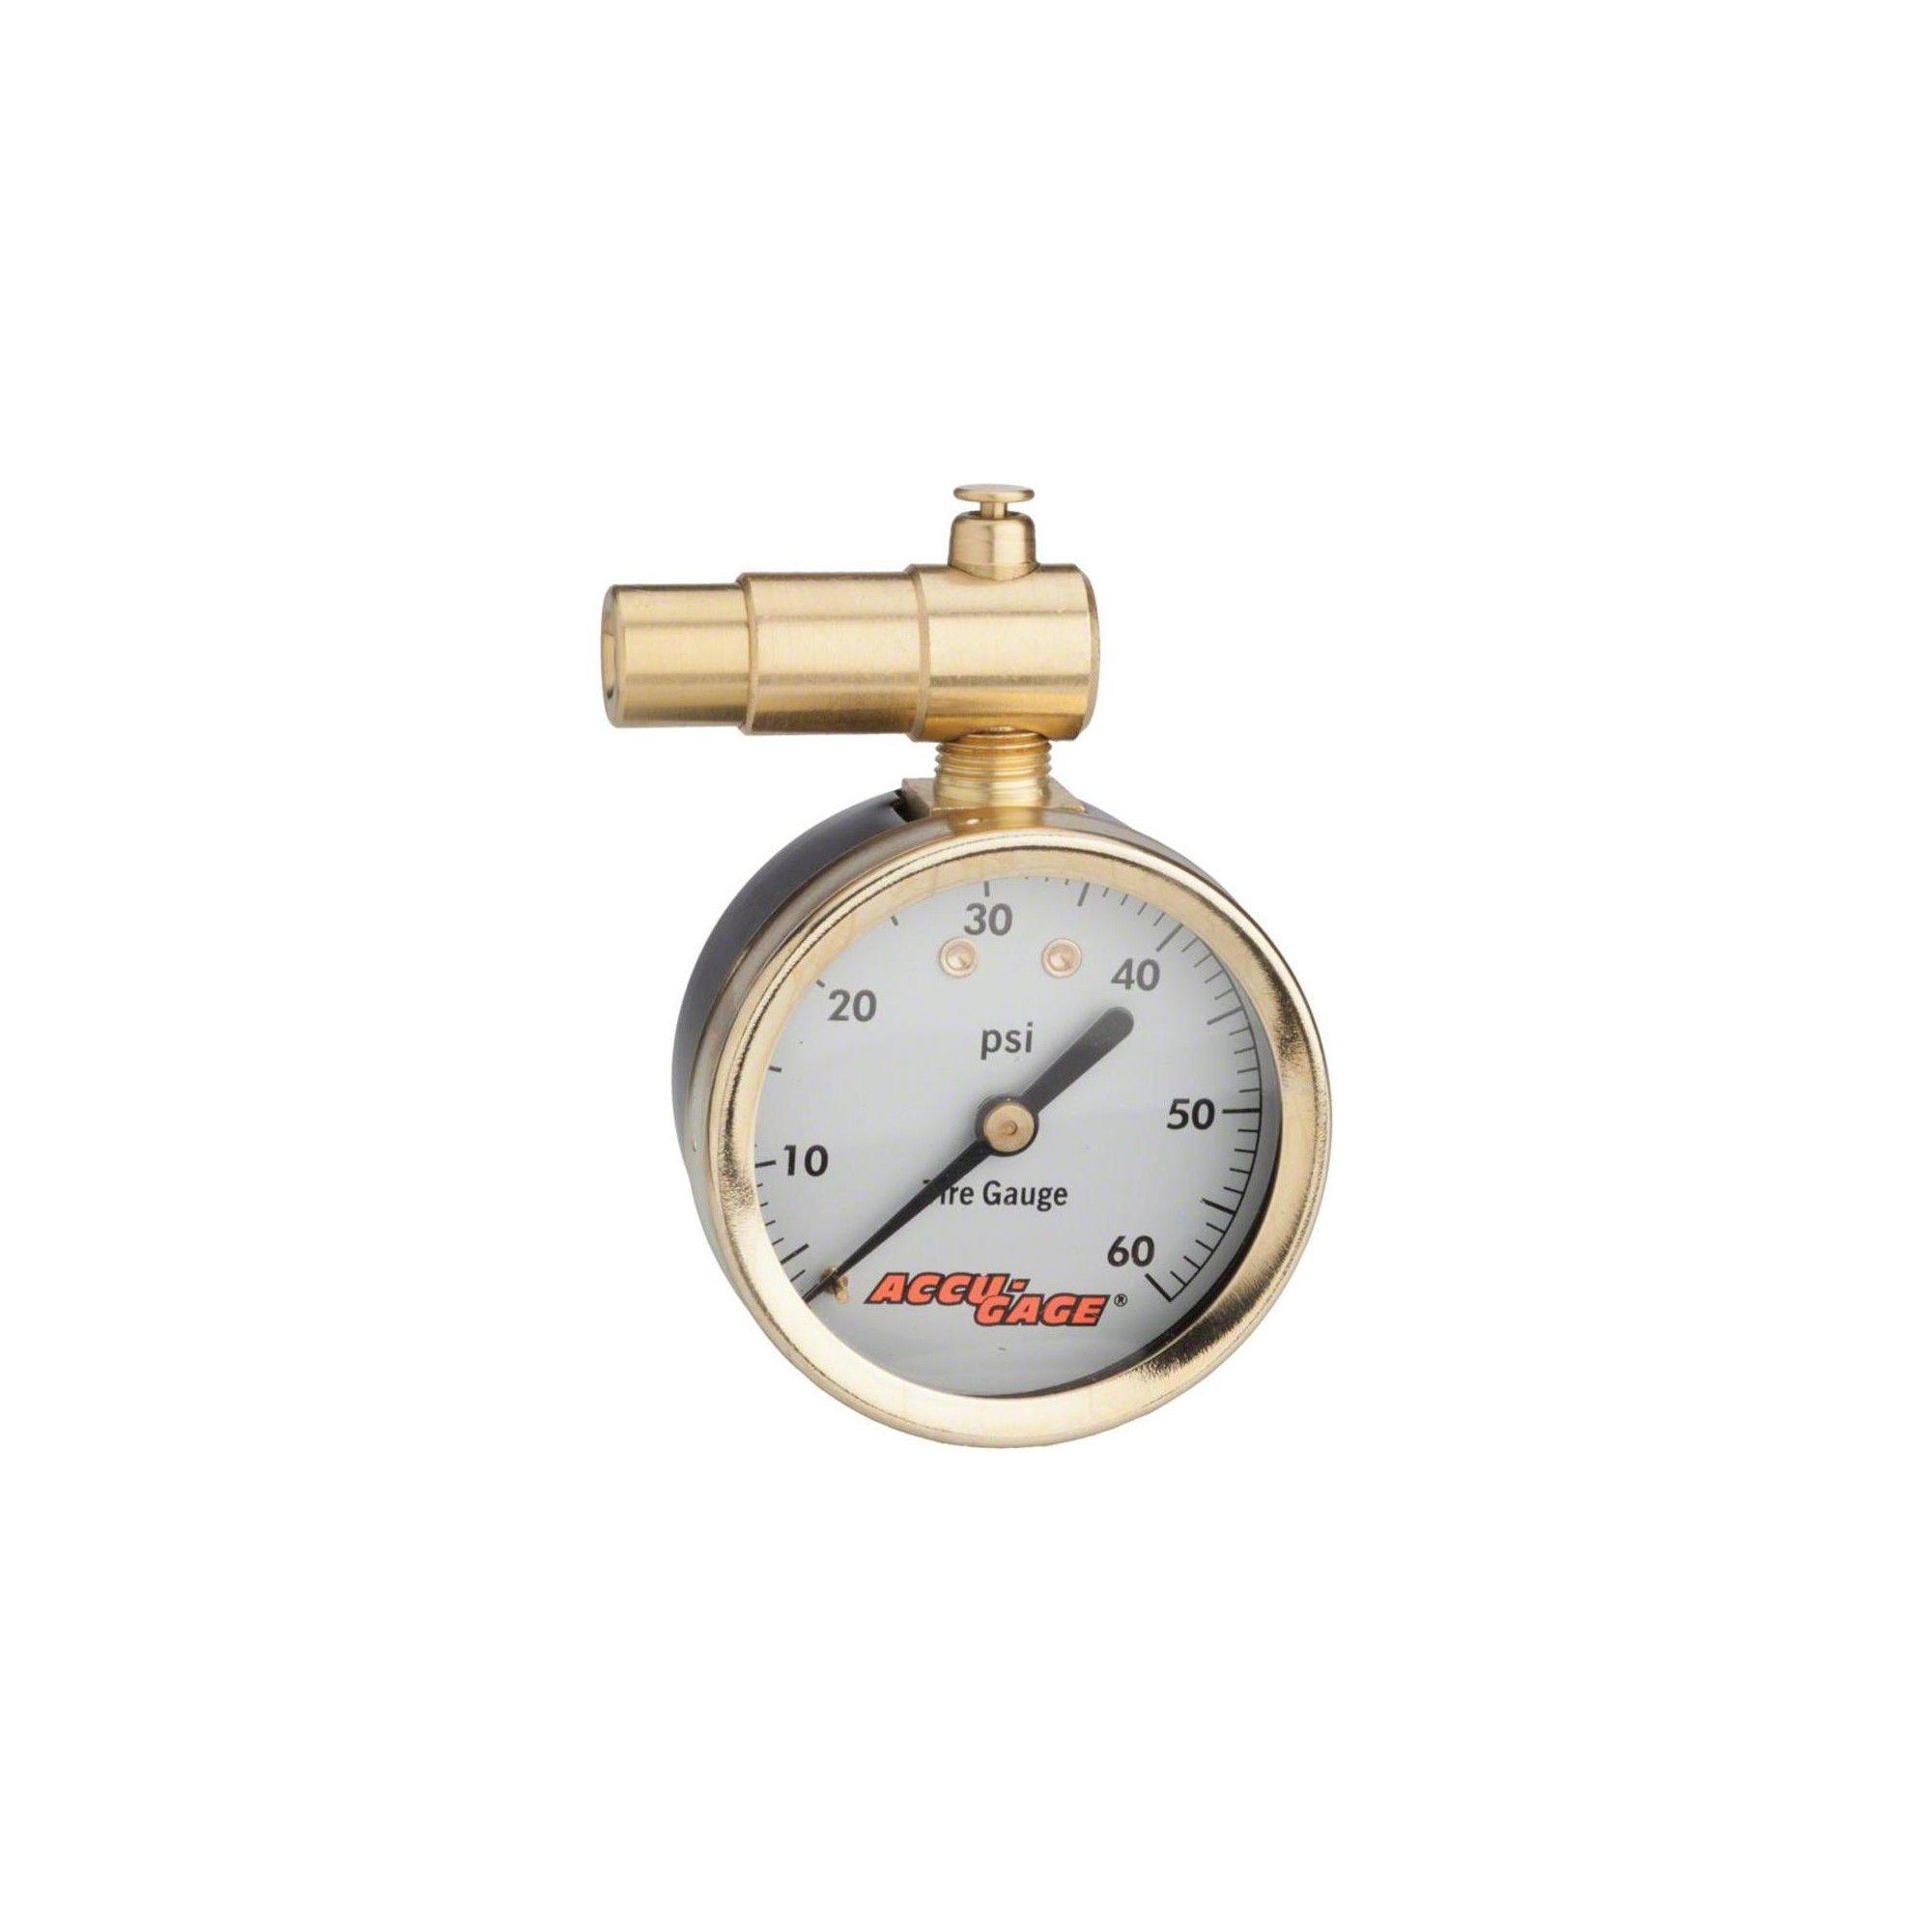 Meiser Presta-Valve Dial Gauge with Pressure Relief 60psi